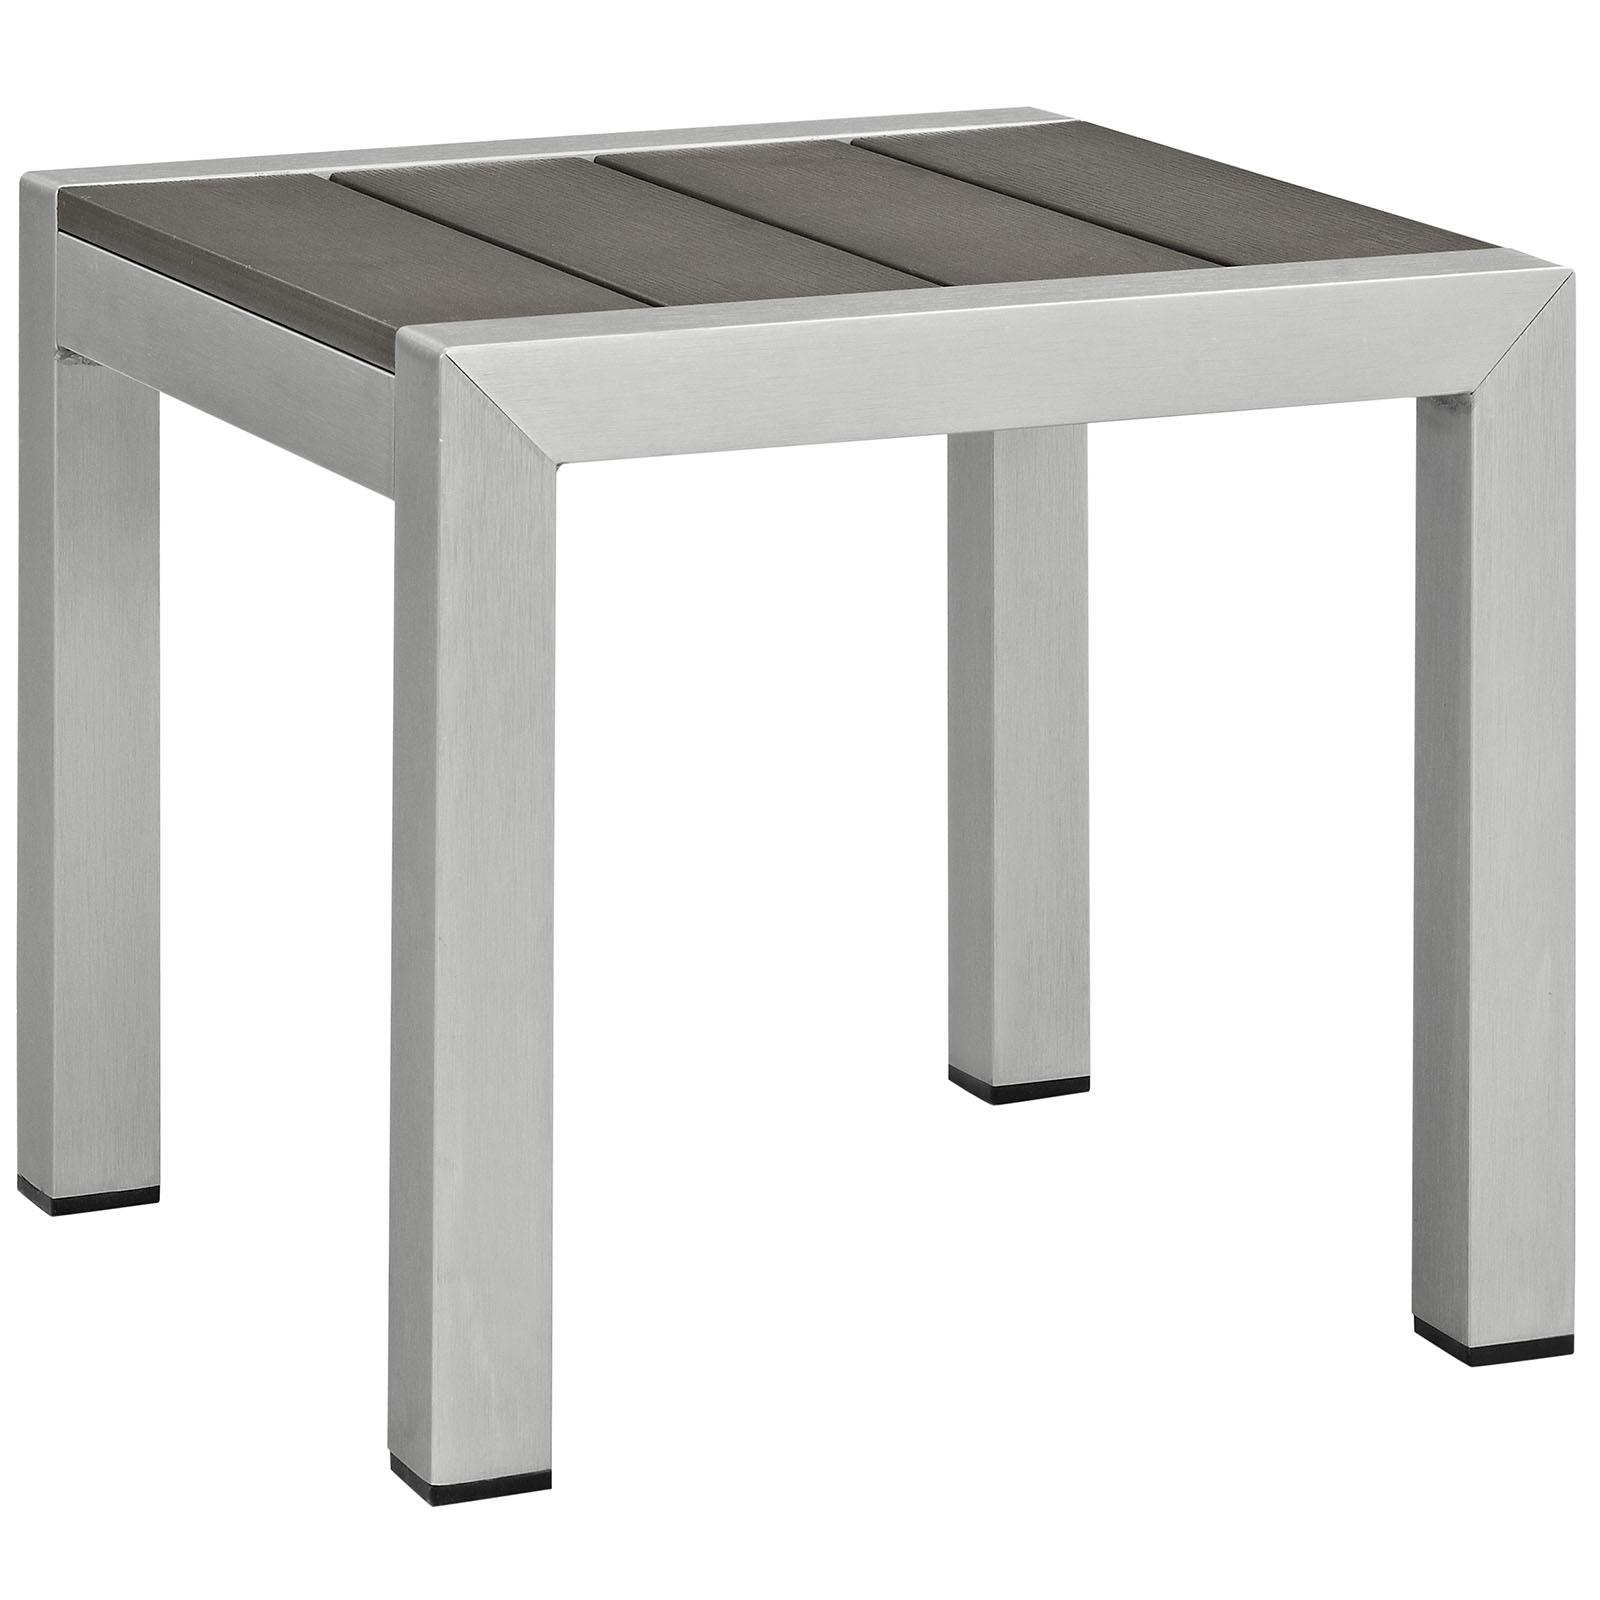 Silver Gray Shore Outdoor Patio Aluminum Side Table